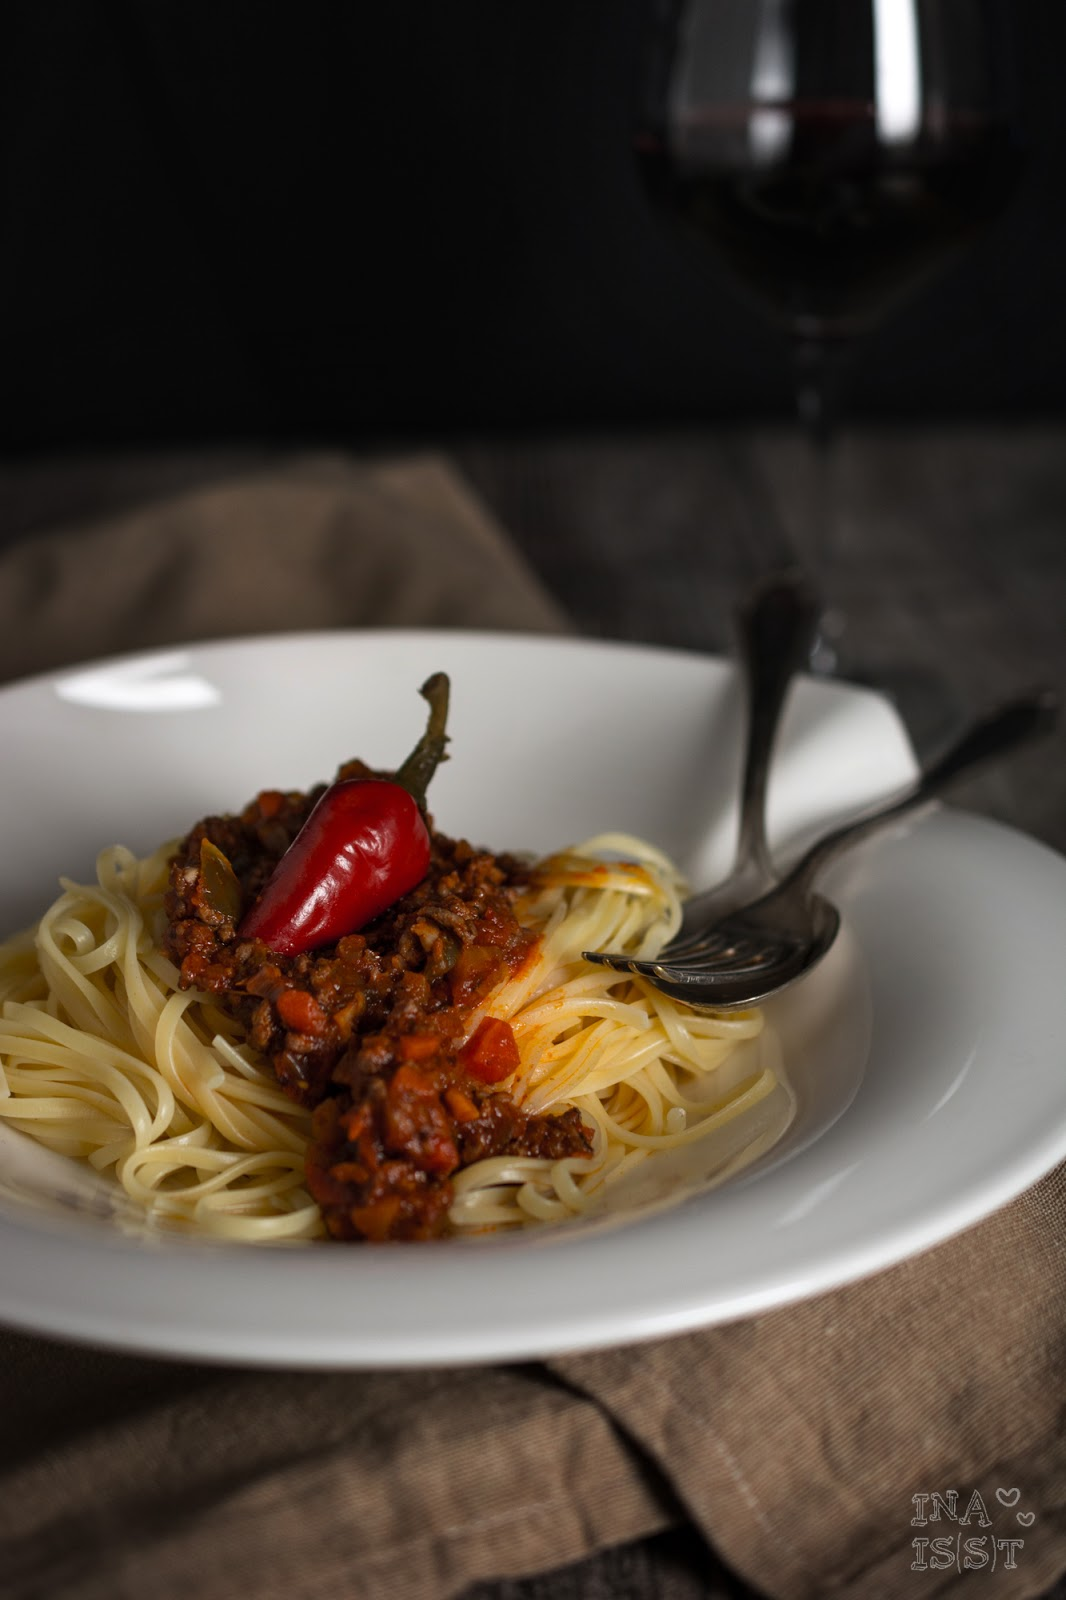 ina is s t scharfe paprika pfefferoni bolognese hot chili pepper bolognese. Black Bedroom Furniture Sets. Home Design Ideas